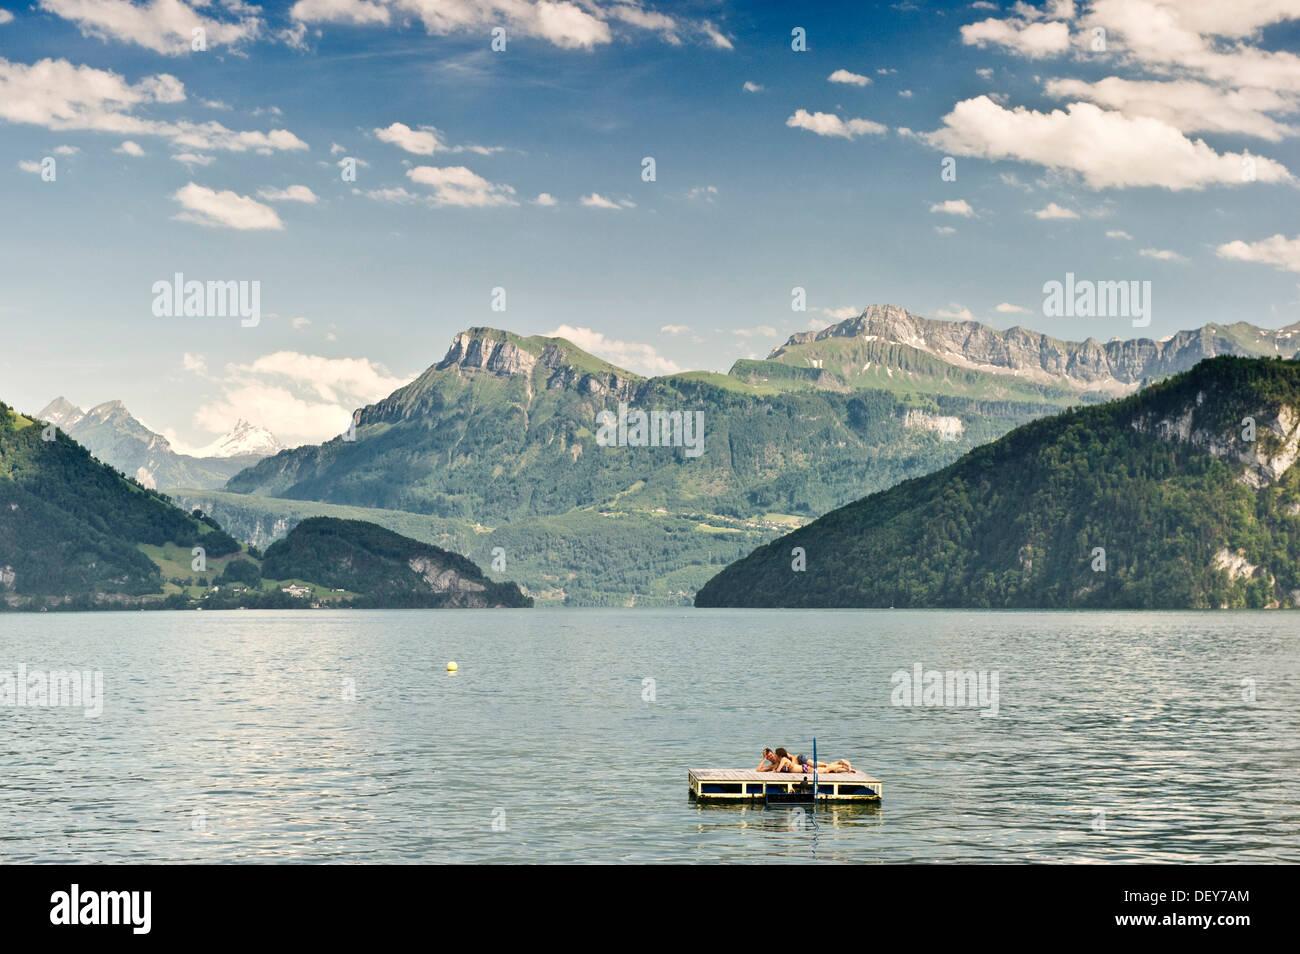 Lake Lucerne with a swimming island, Weggis, Canon of Lucerne, Switzerland, Europe - Stock Image